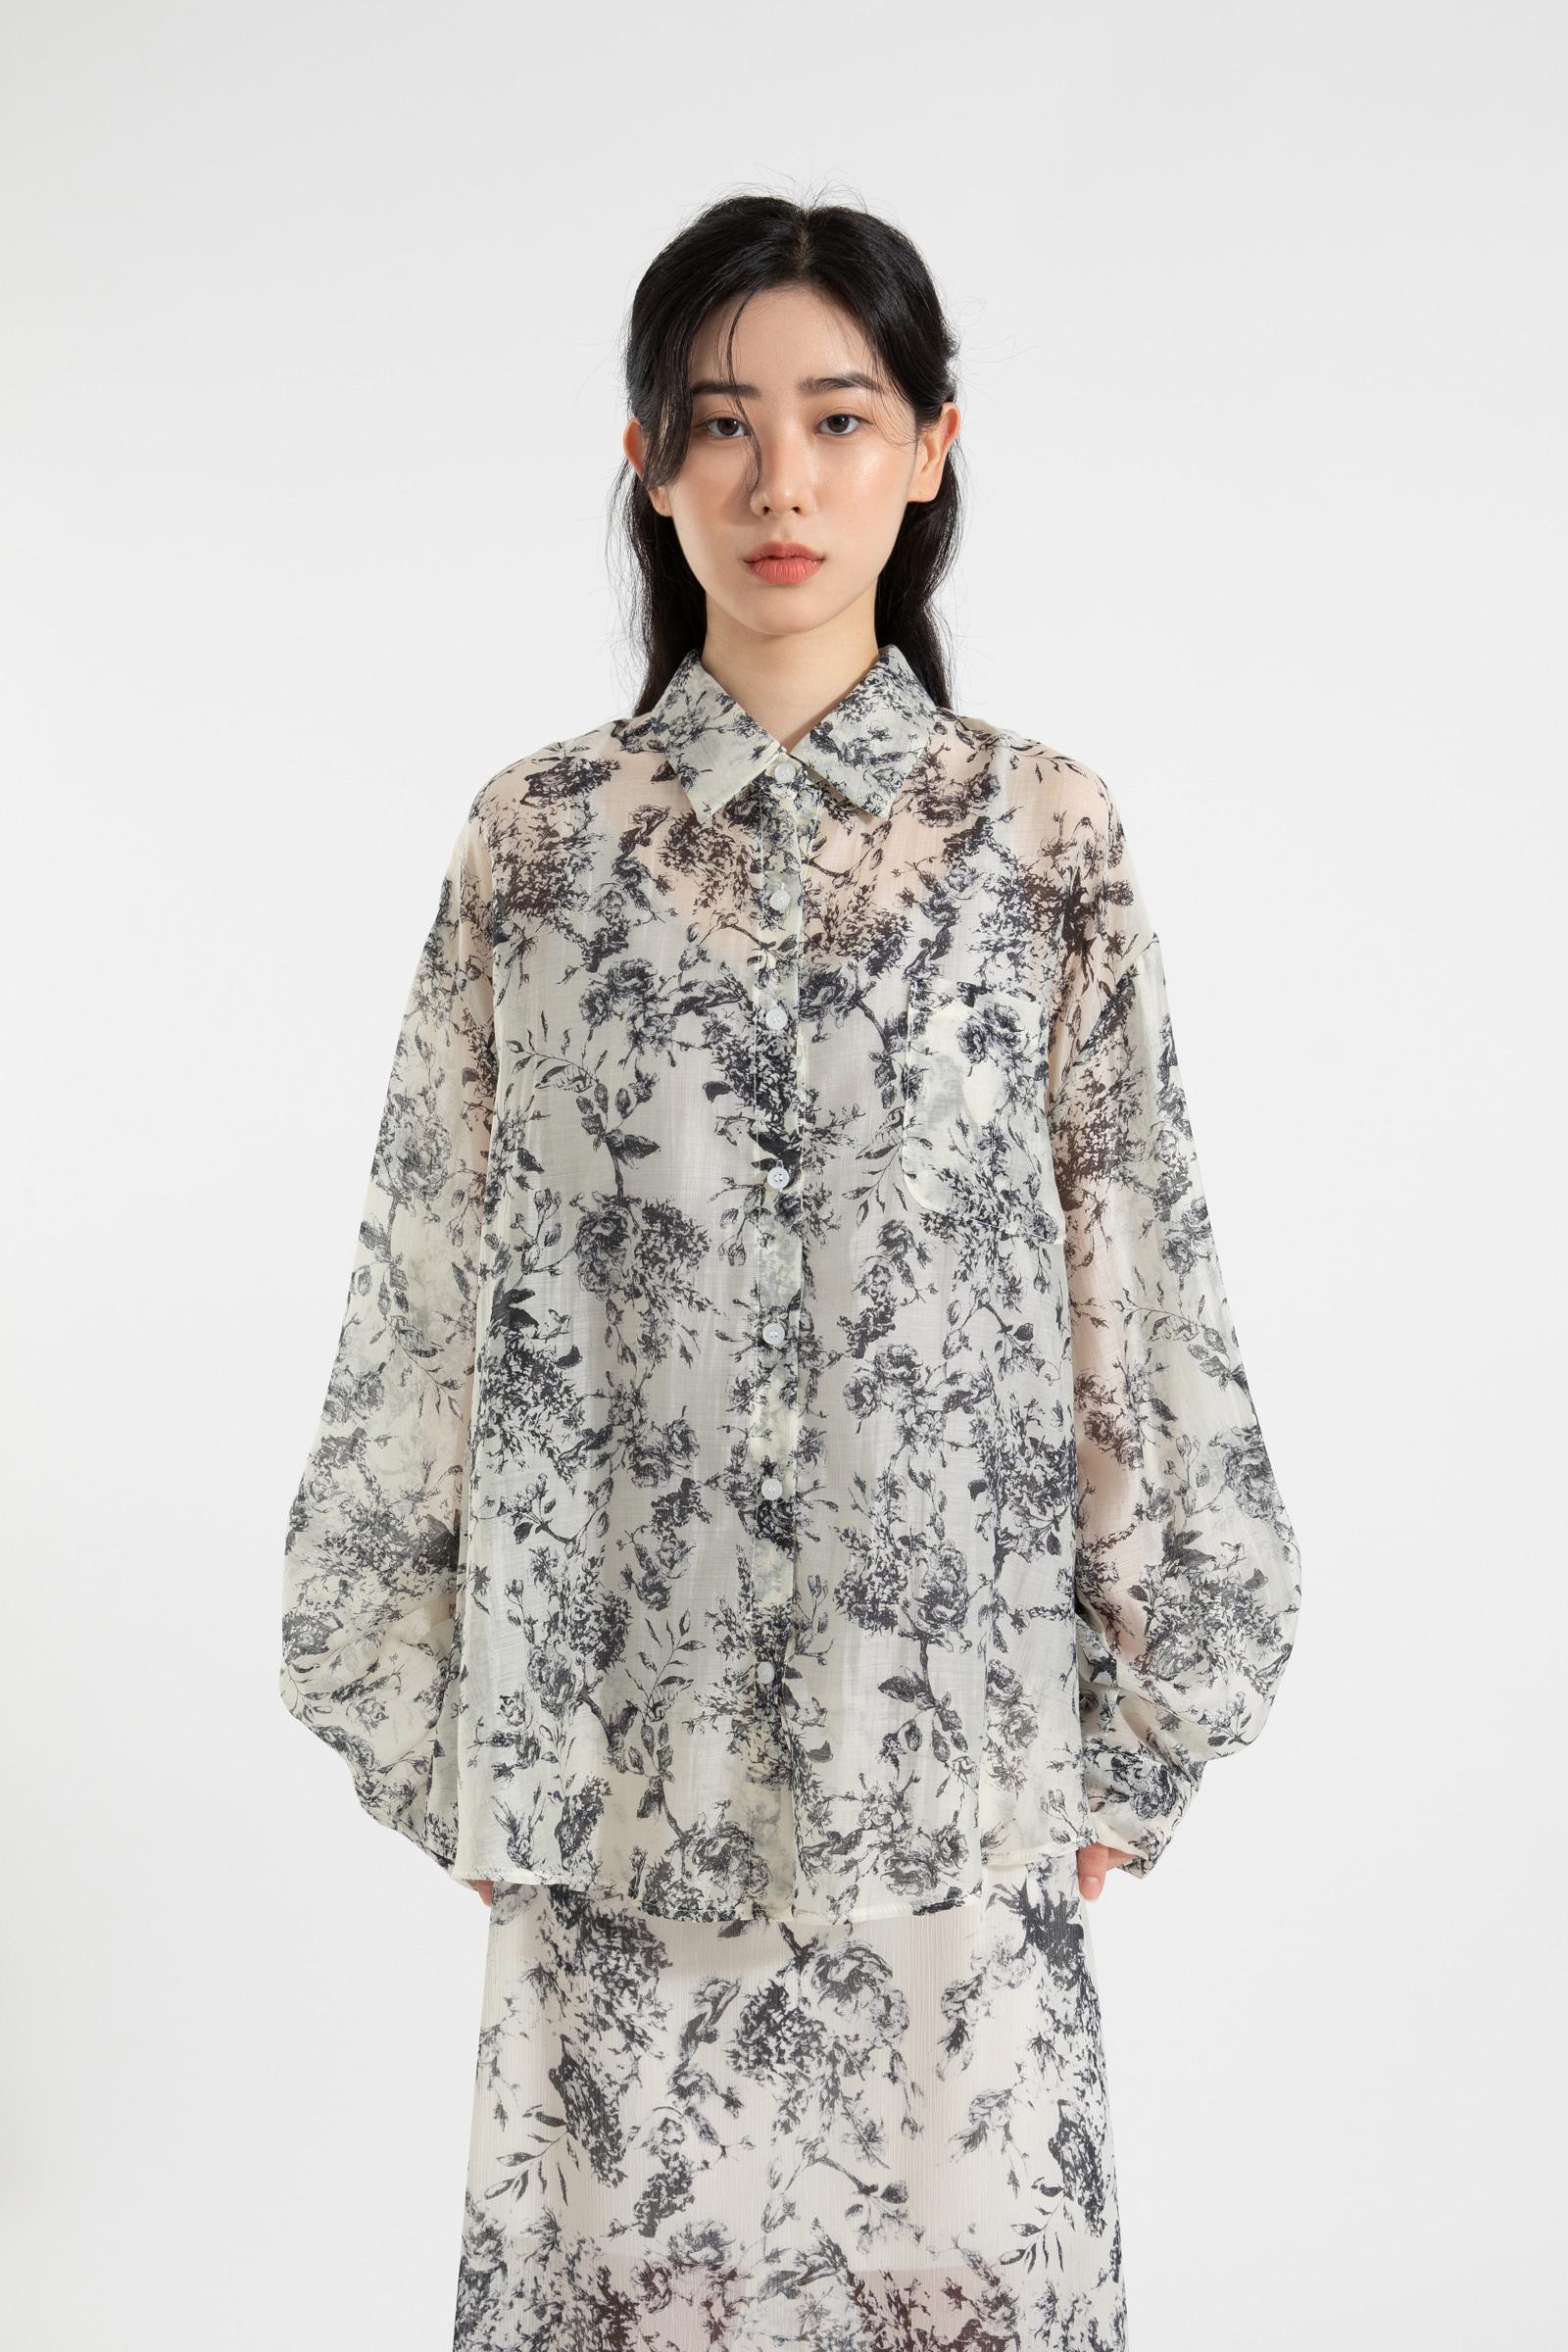 Bacardi pattern over shirt